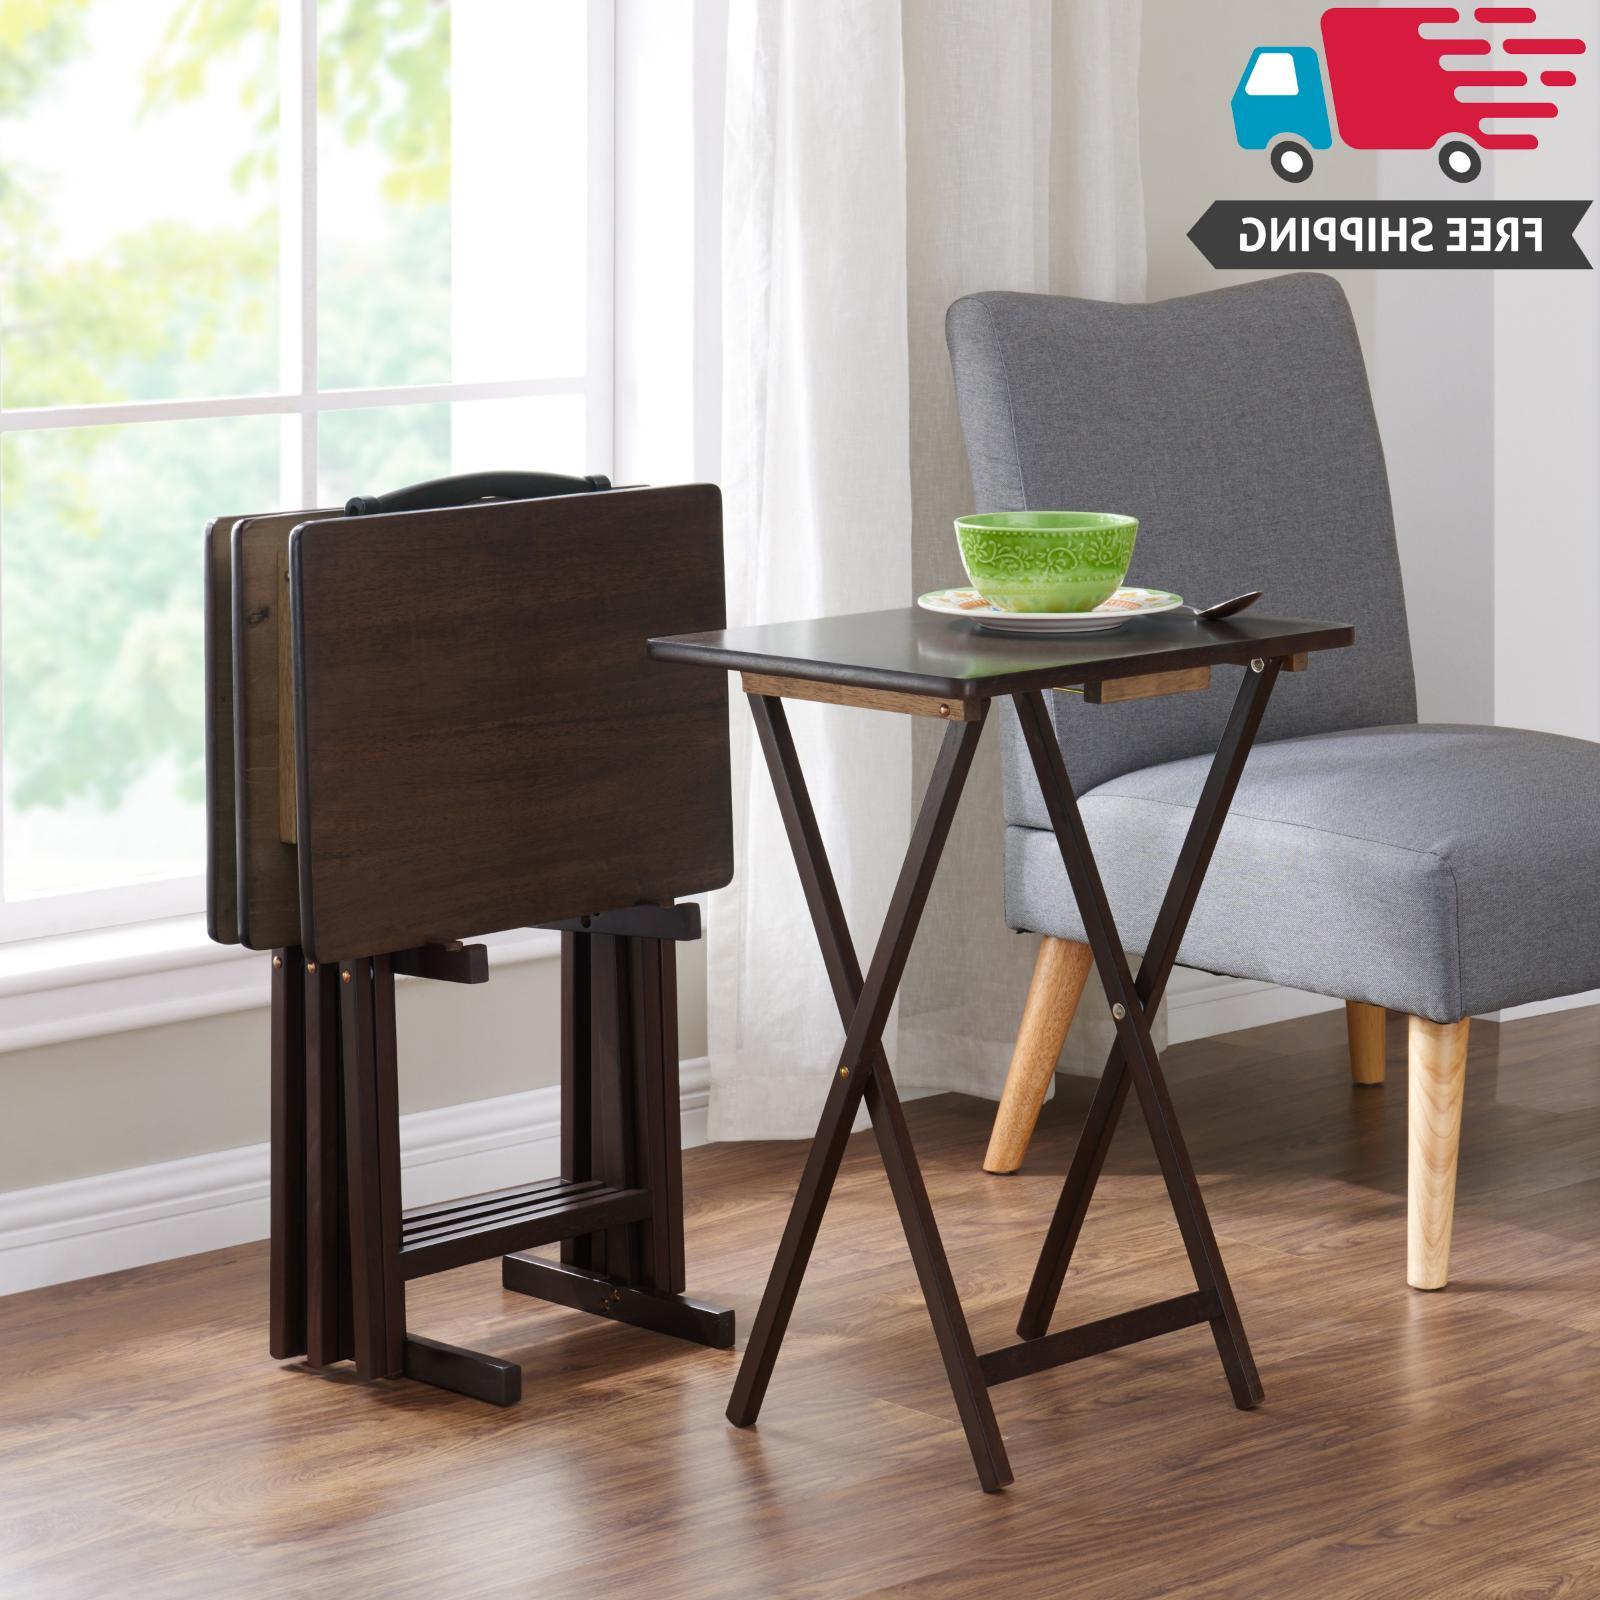 5 Piece Folding TV 4 Tray + Stand Set Wood Dinner Walnut Sid